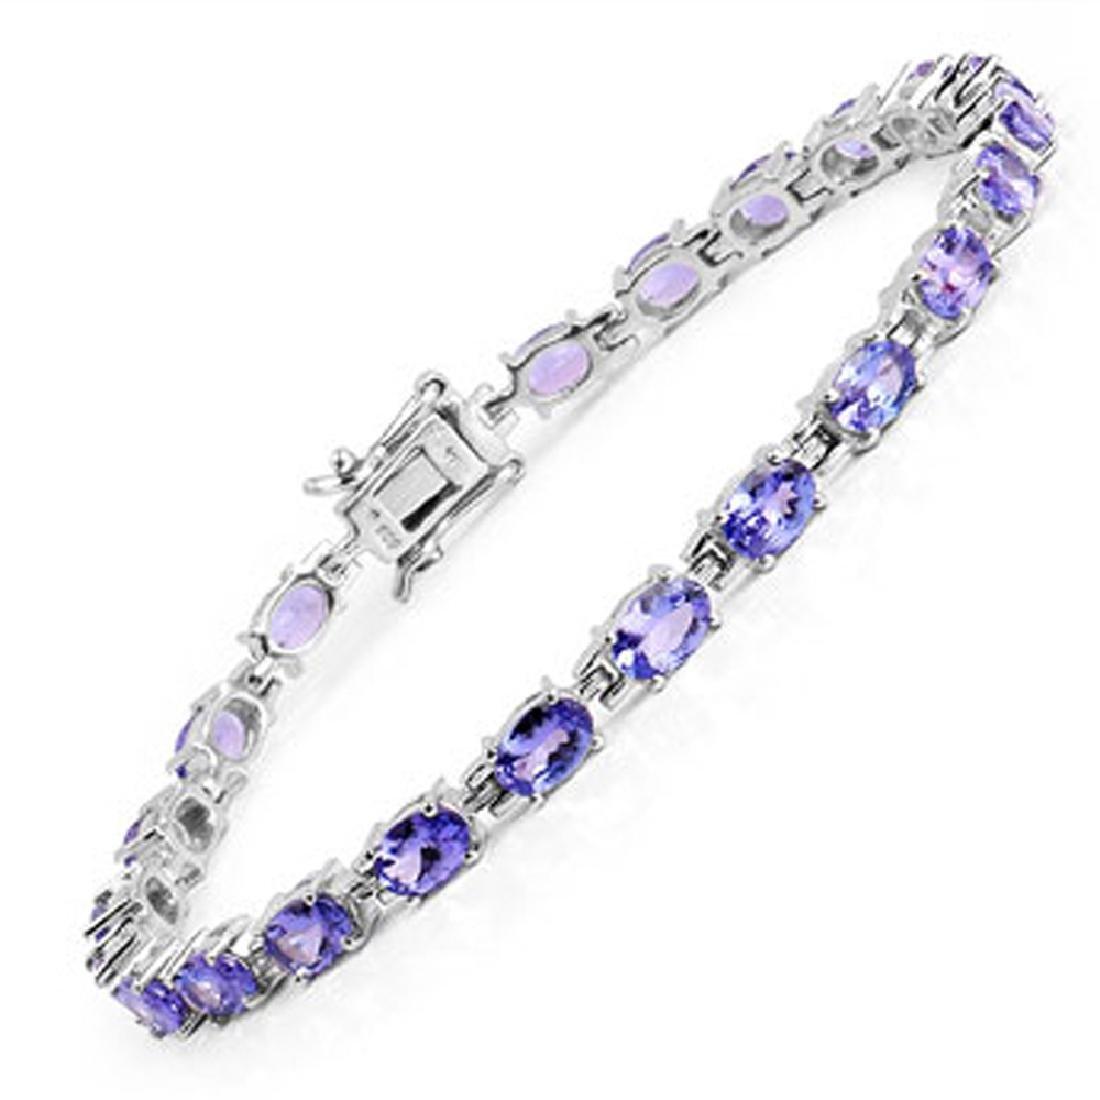 APP: 8.2k Fine Jewelry 9.68CT Oval Cut Tanzanite And